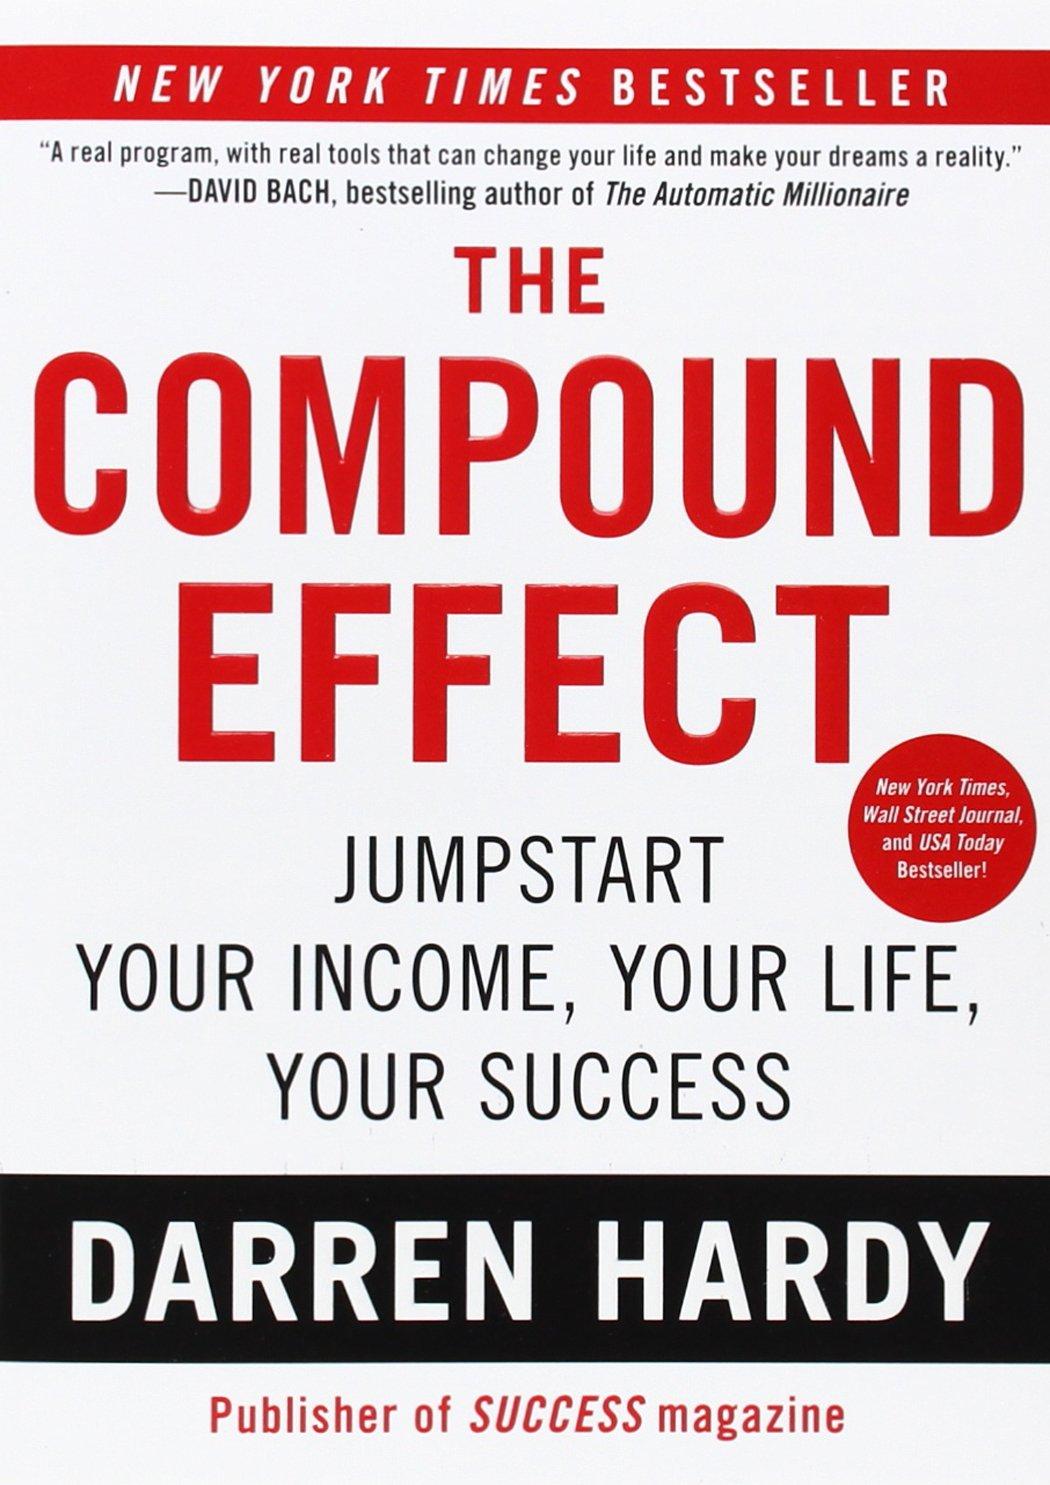 darren hardy, the compound effect, erica casnter